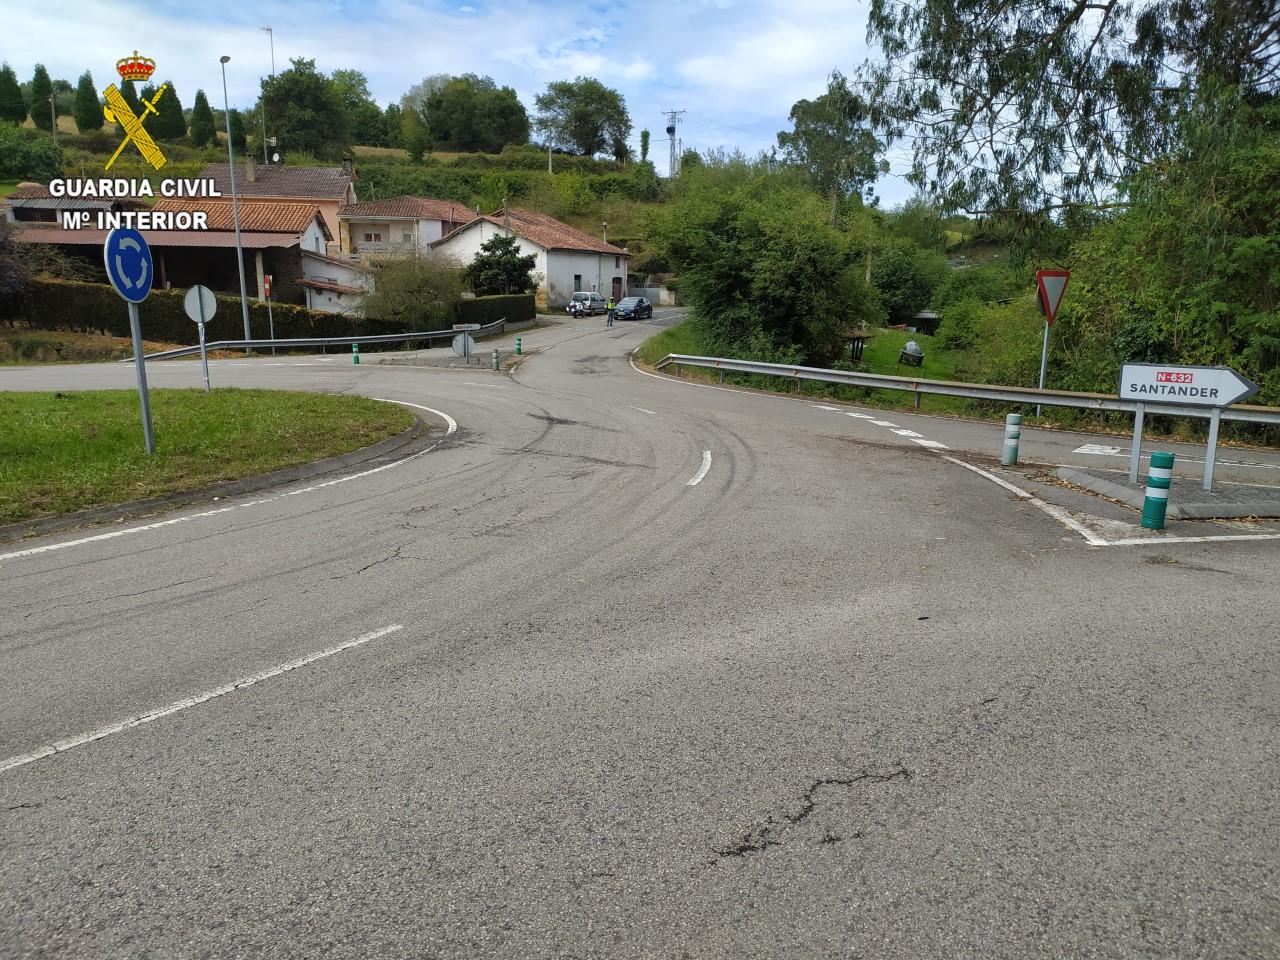 La Guardia Civil evita una carrera ilegal de vehículos en la carretera N-632